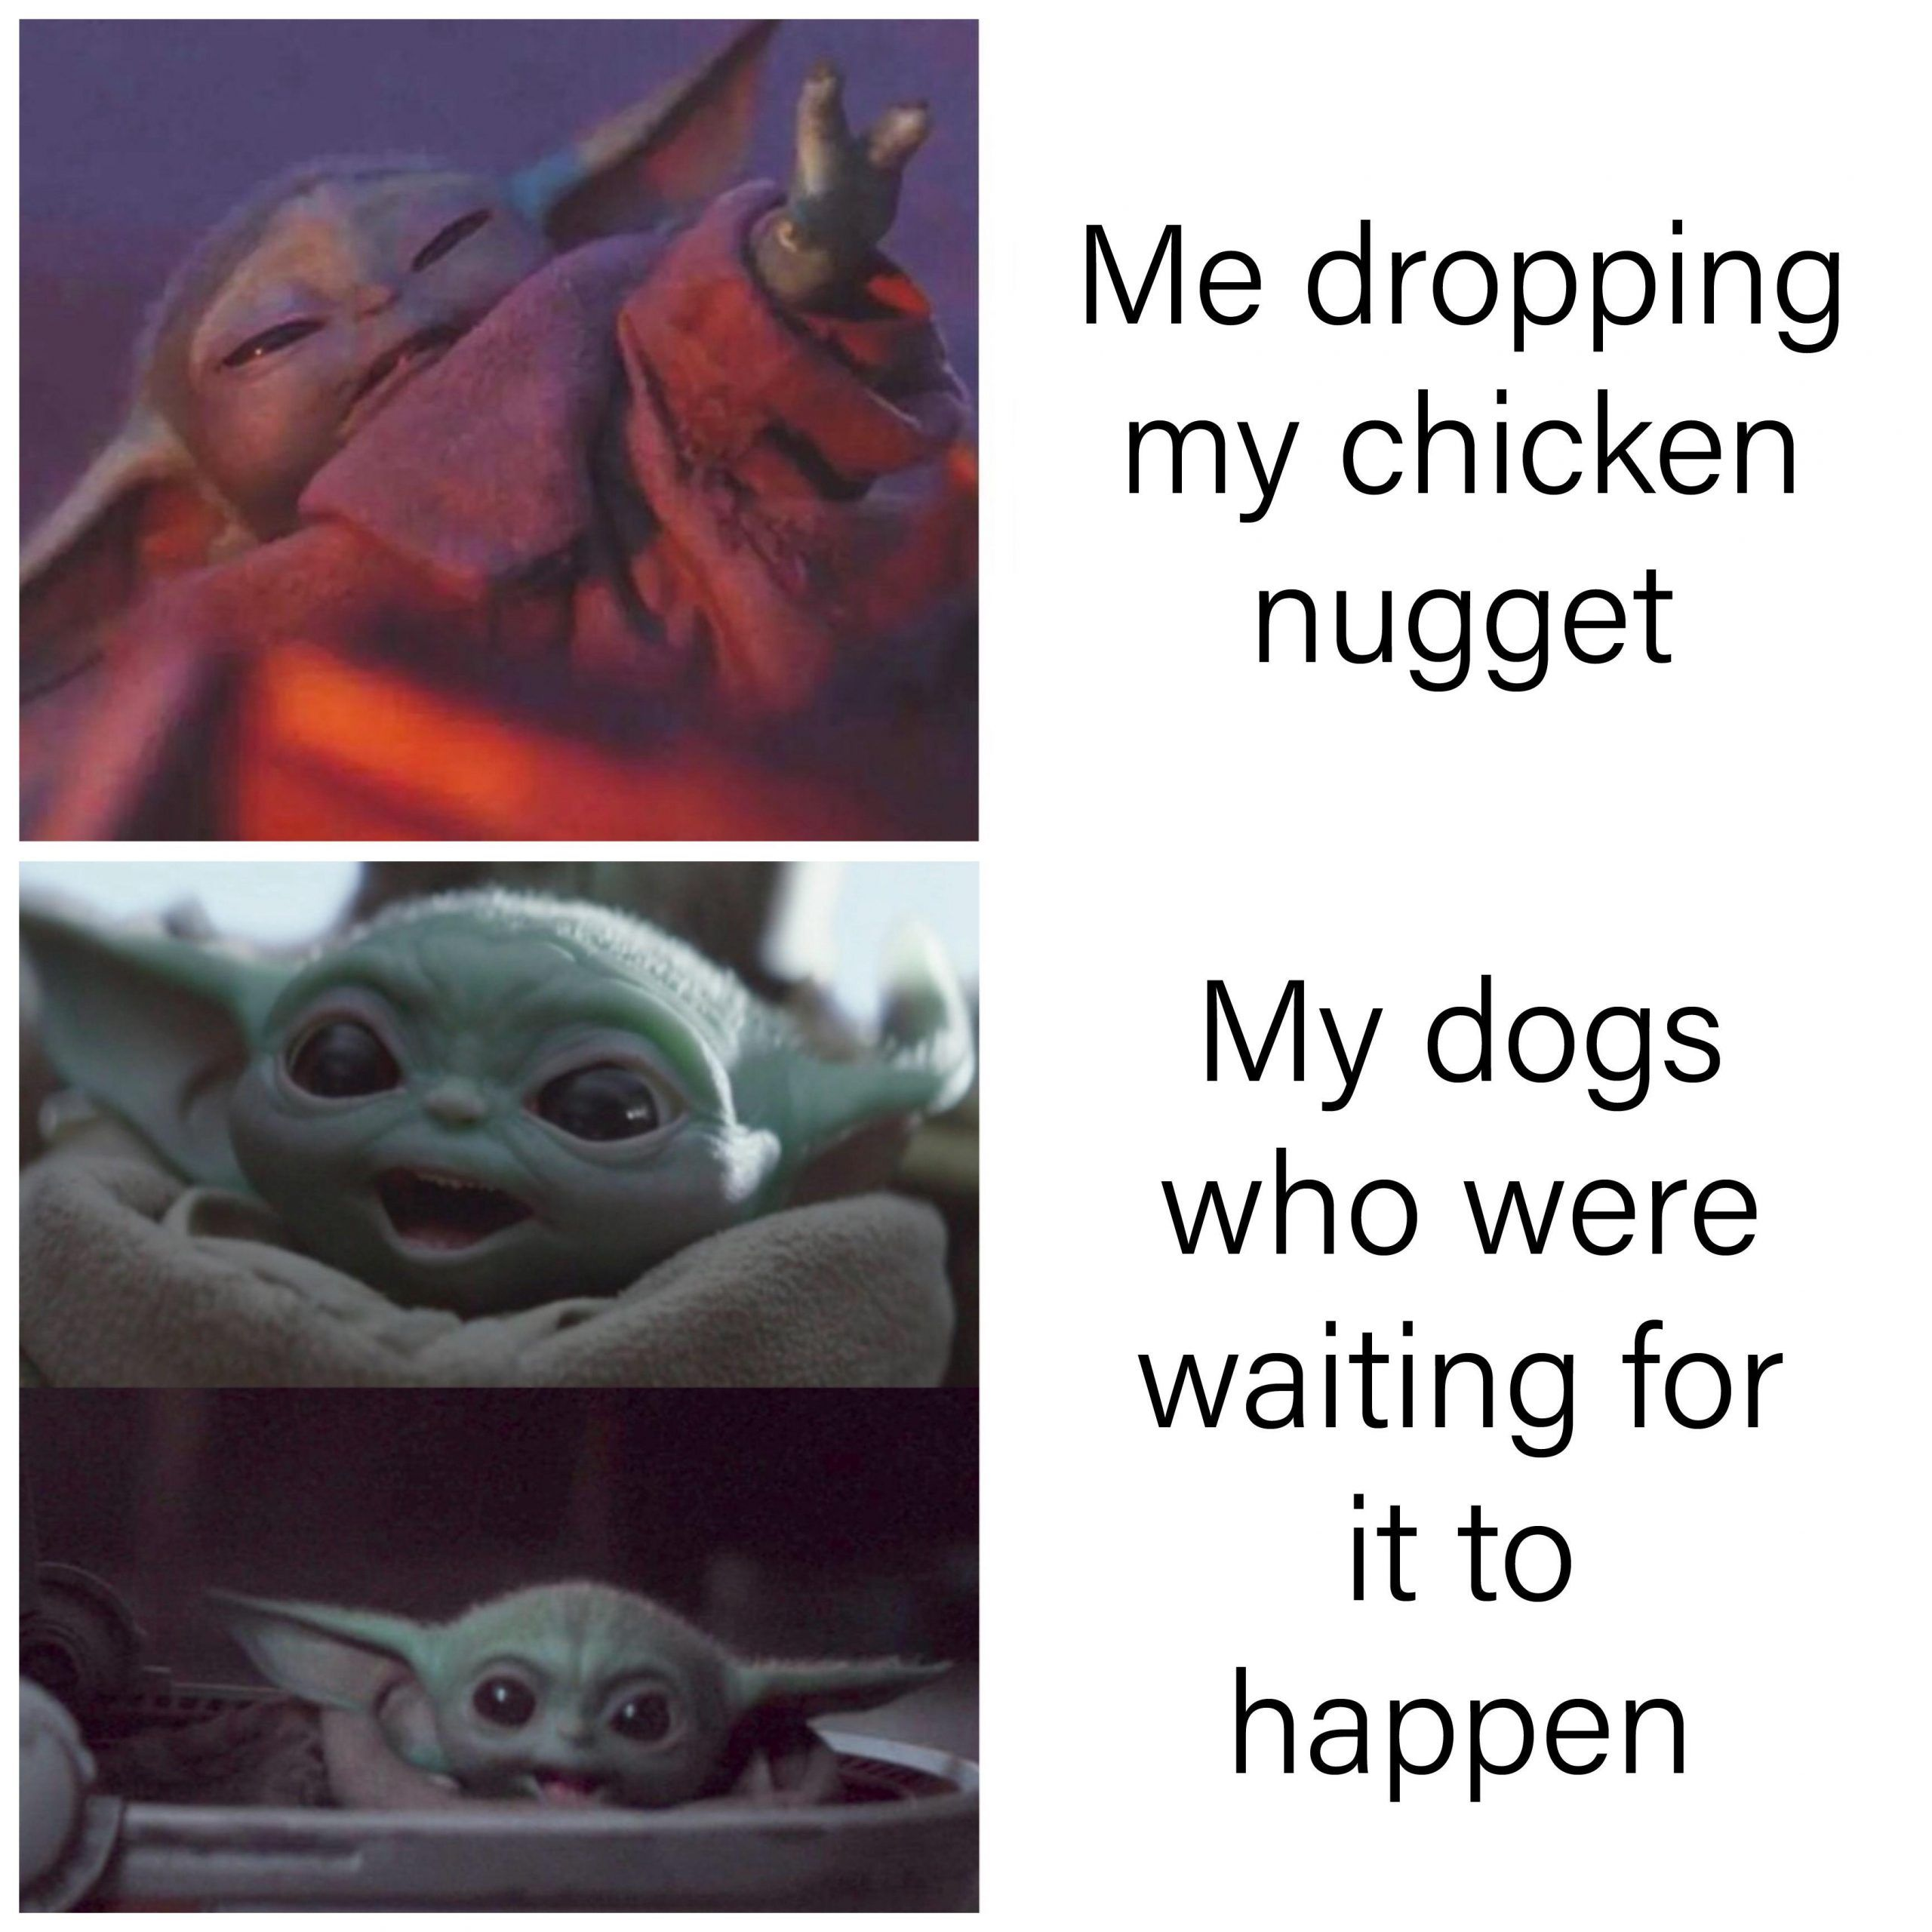 20 Funny New Year 2020 Memes So Hilarious 3 Funny Memes Yoda Funny Memes